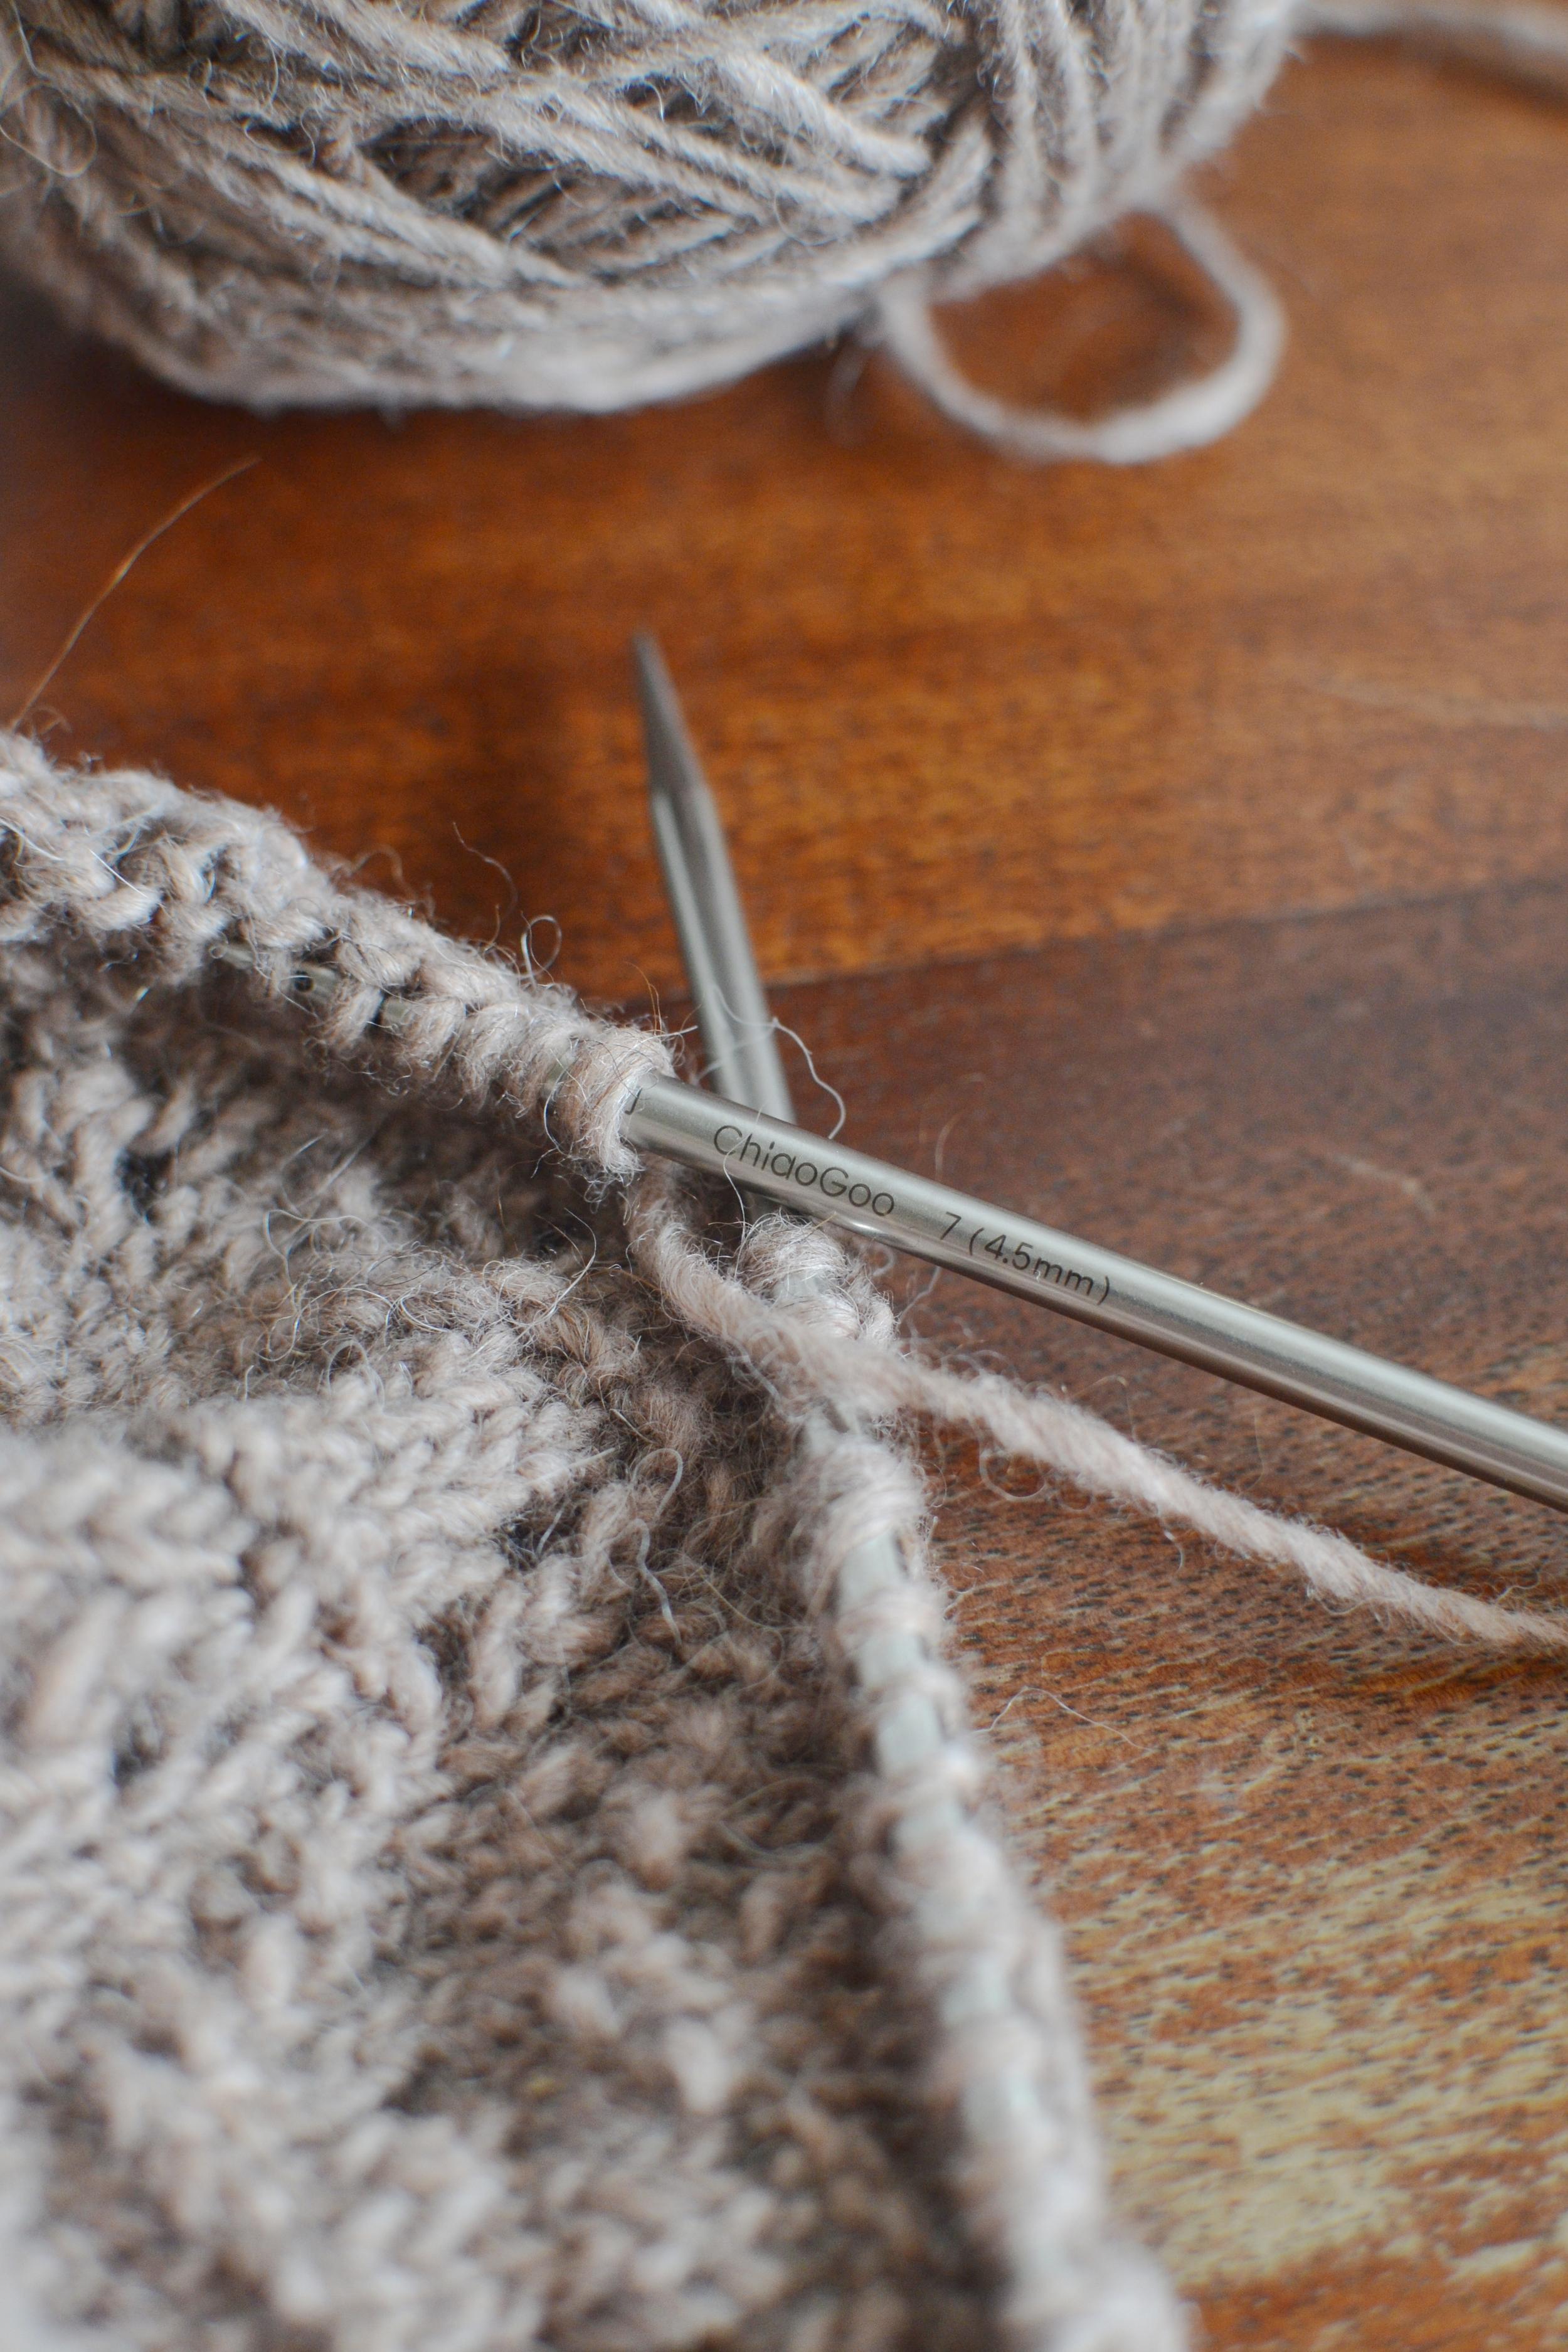 Chiagoo circualar needles kit review / Mandarine's